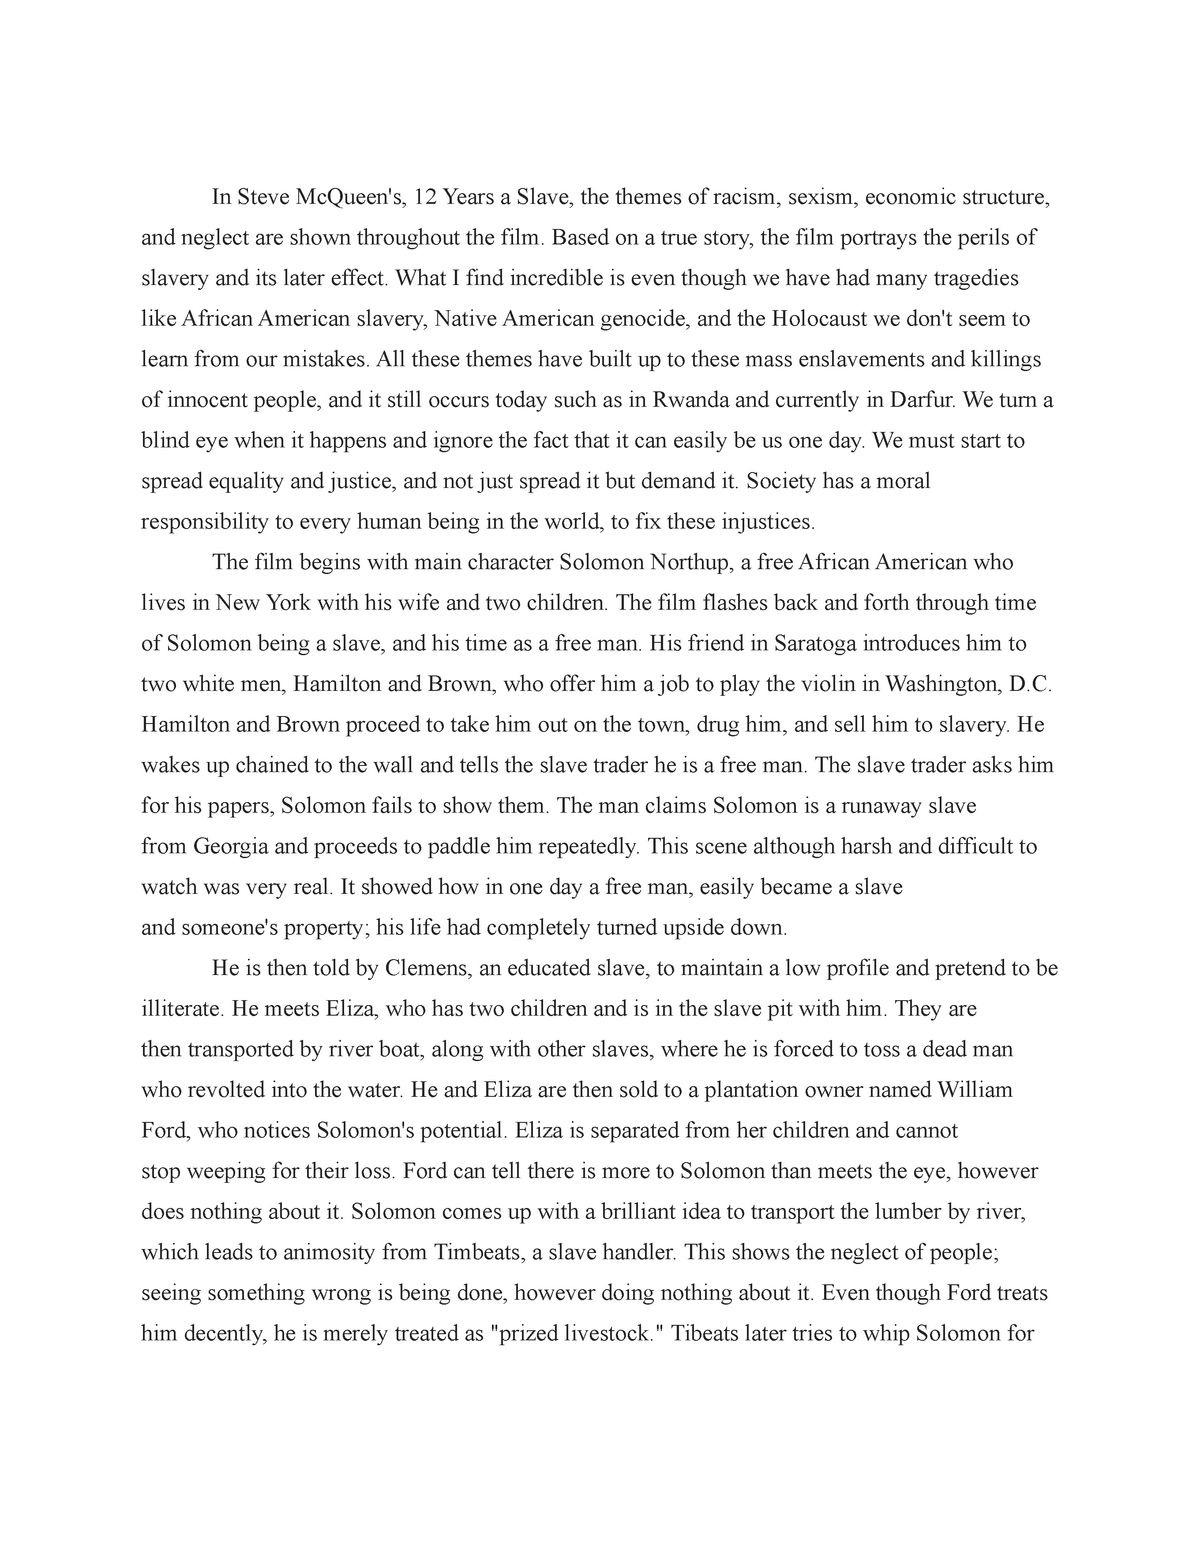 12 years slave essay